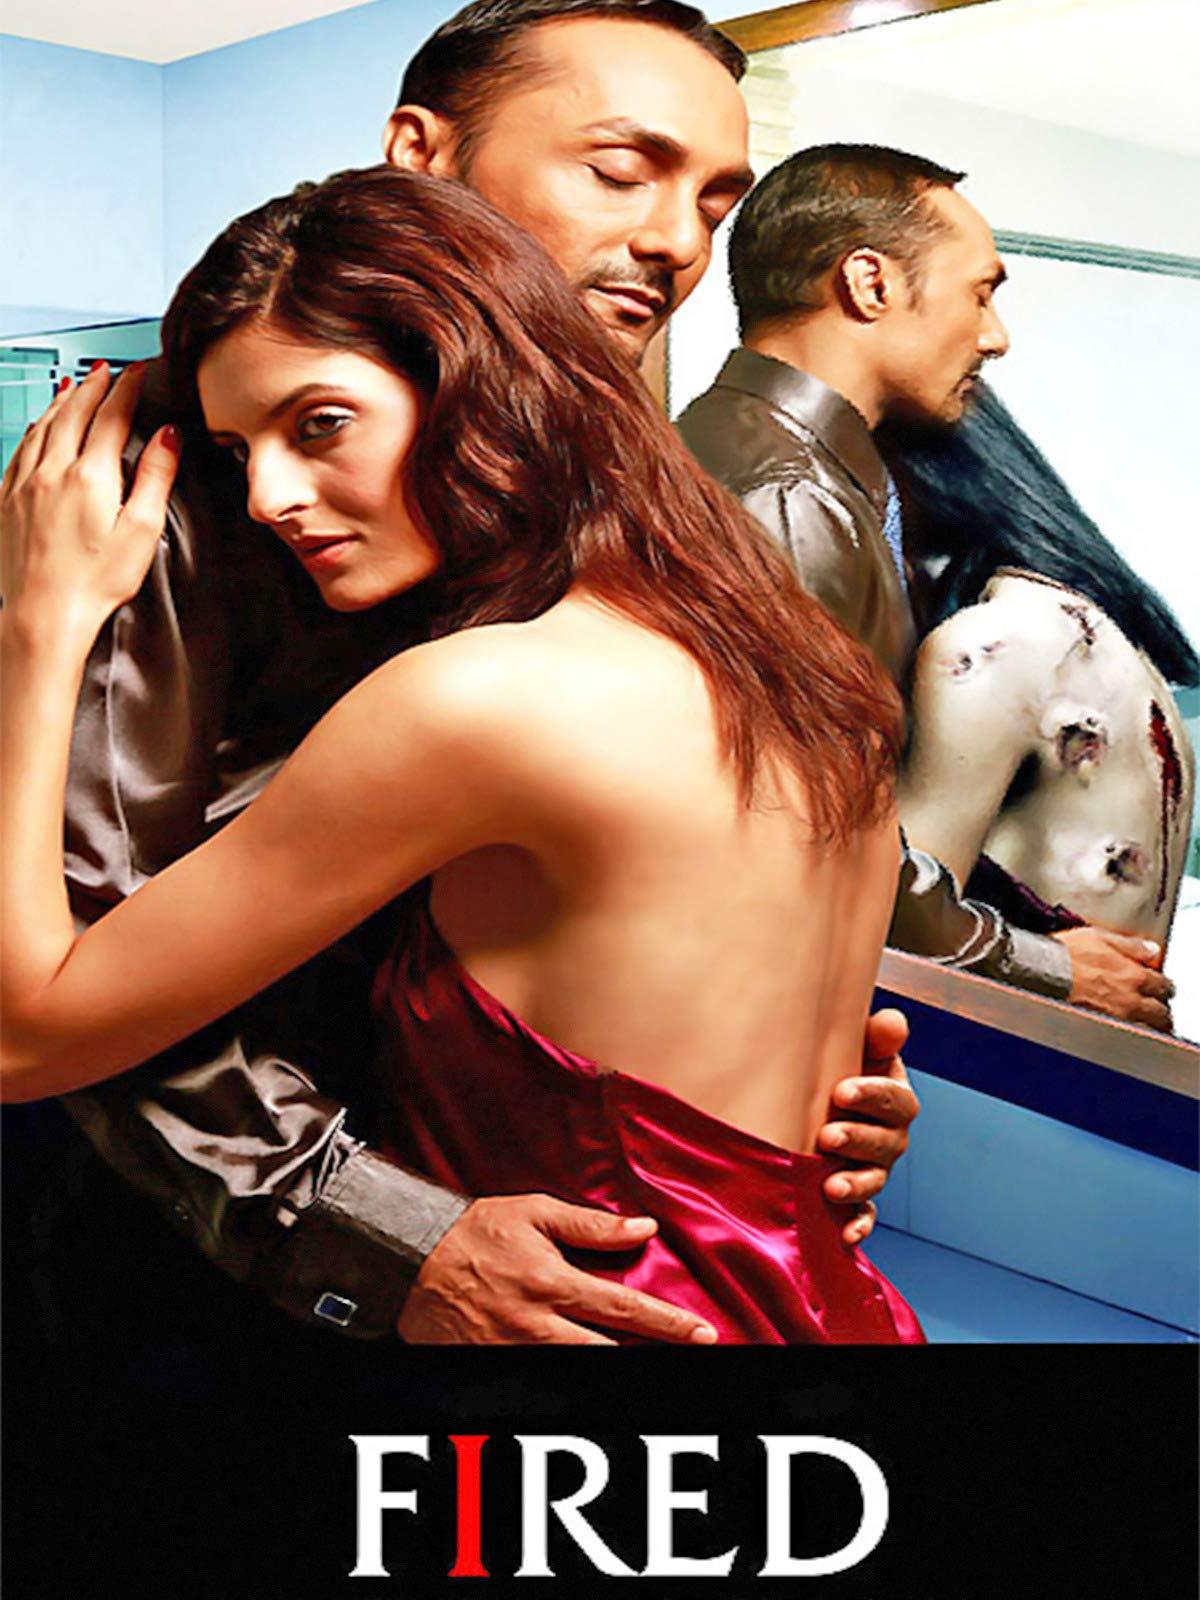 Fired (2010) Hindi 720p HDRip x264 650MB ESubs Free Download